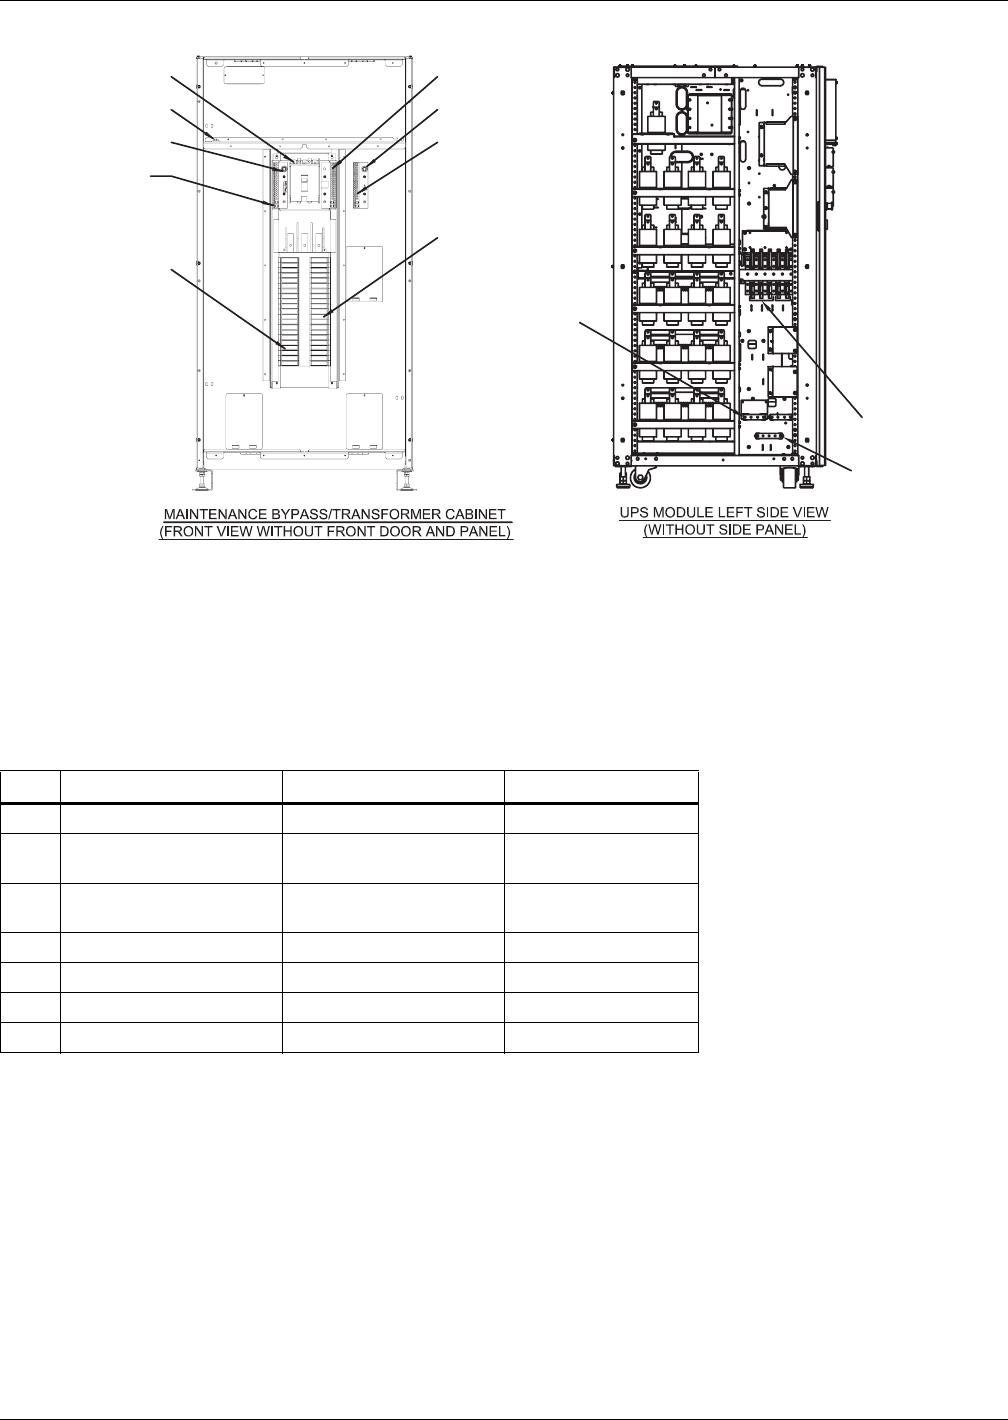 Emerson Liebert Nx 10 30kva Installation Manual Ups Bypass Switch Wiring Diagram Drawings